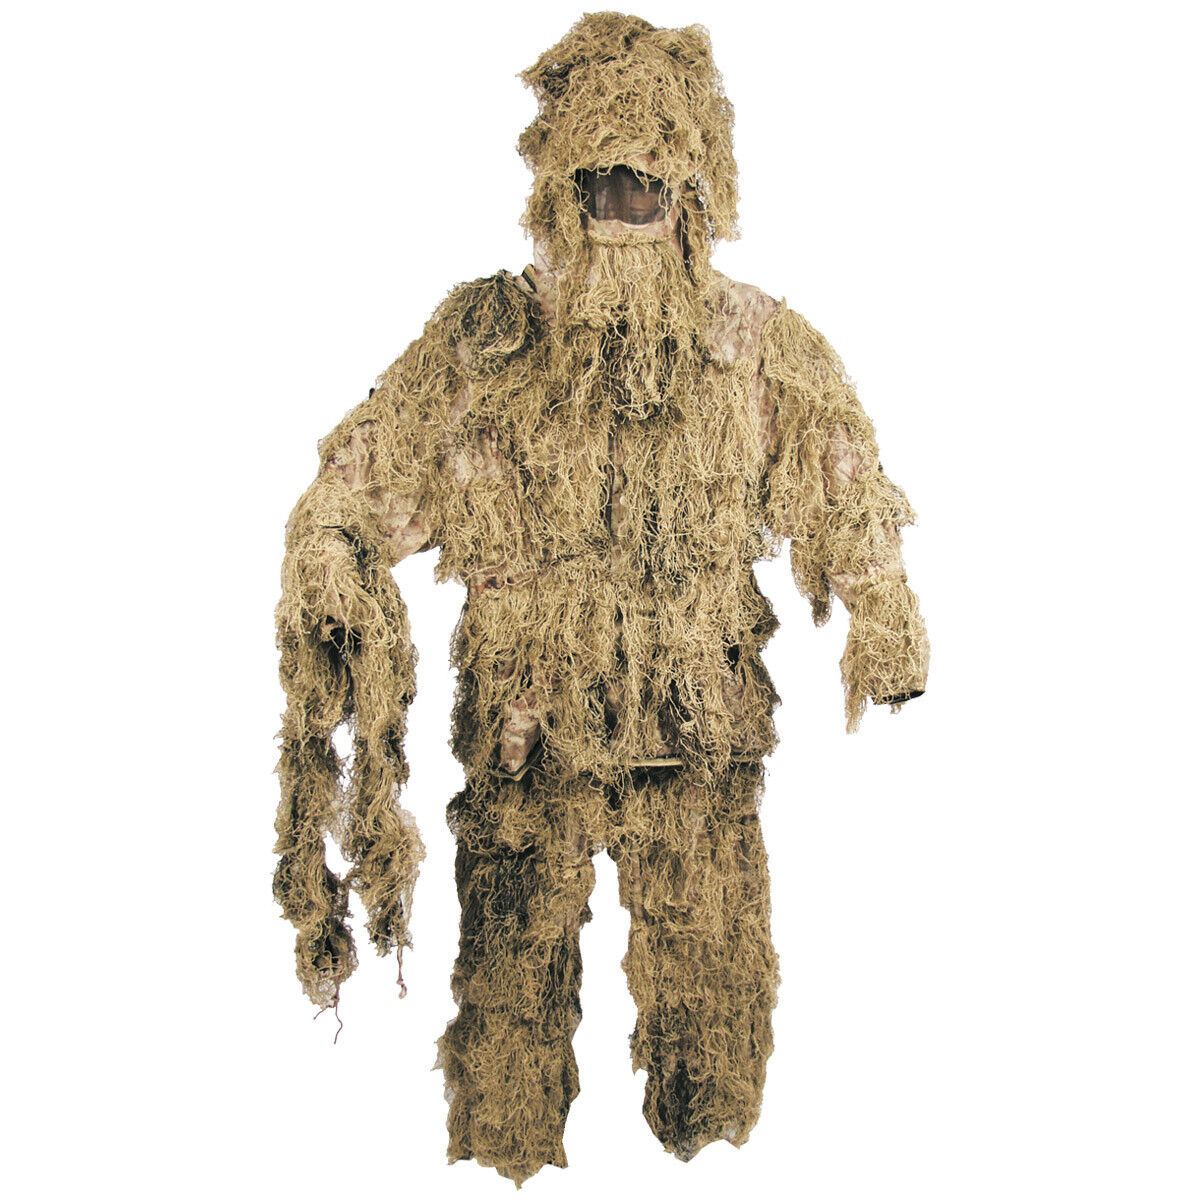 Ghillie Suit Camuflaje Camo Traje Ajustado Caza Pesca Avistamiento  Desierto De L  envio rapido a ti